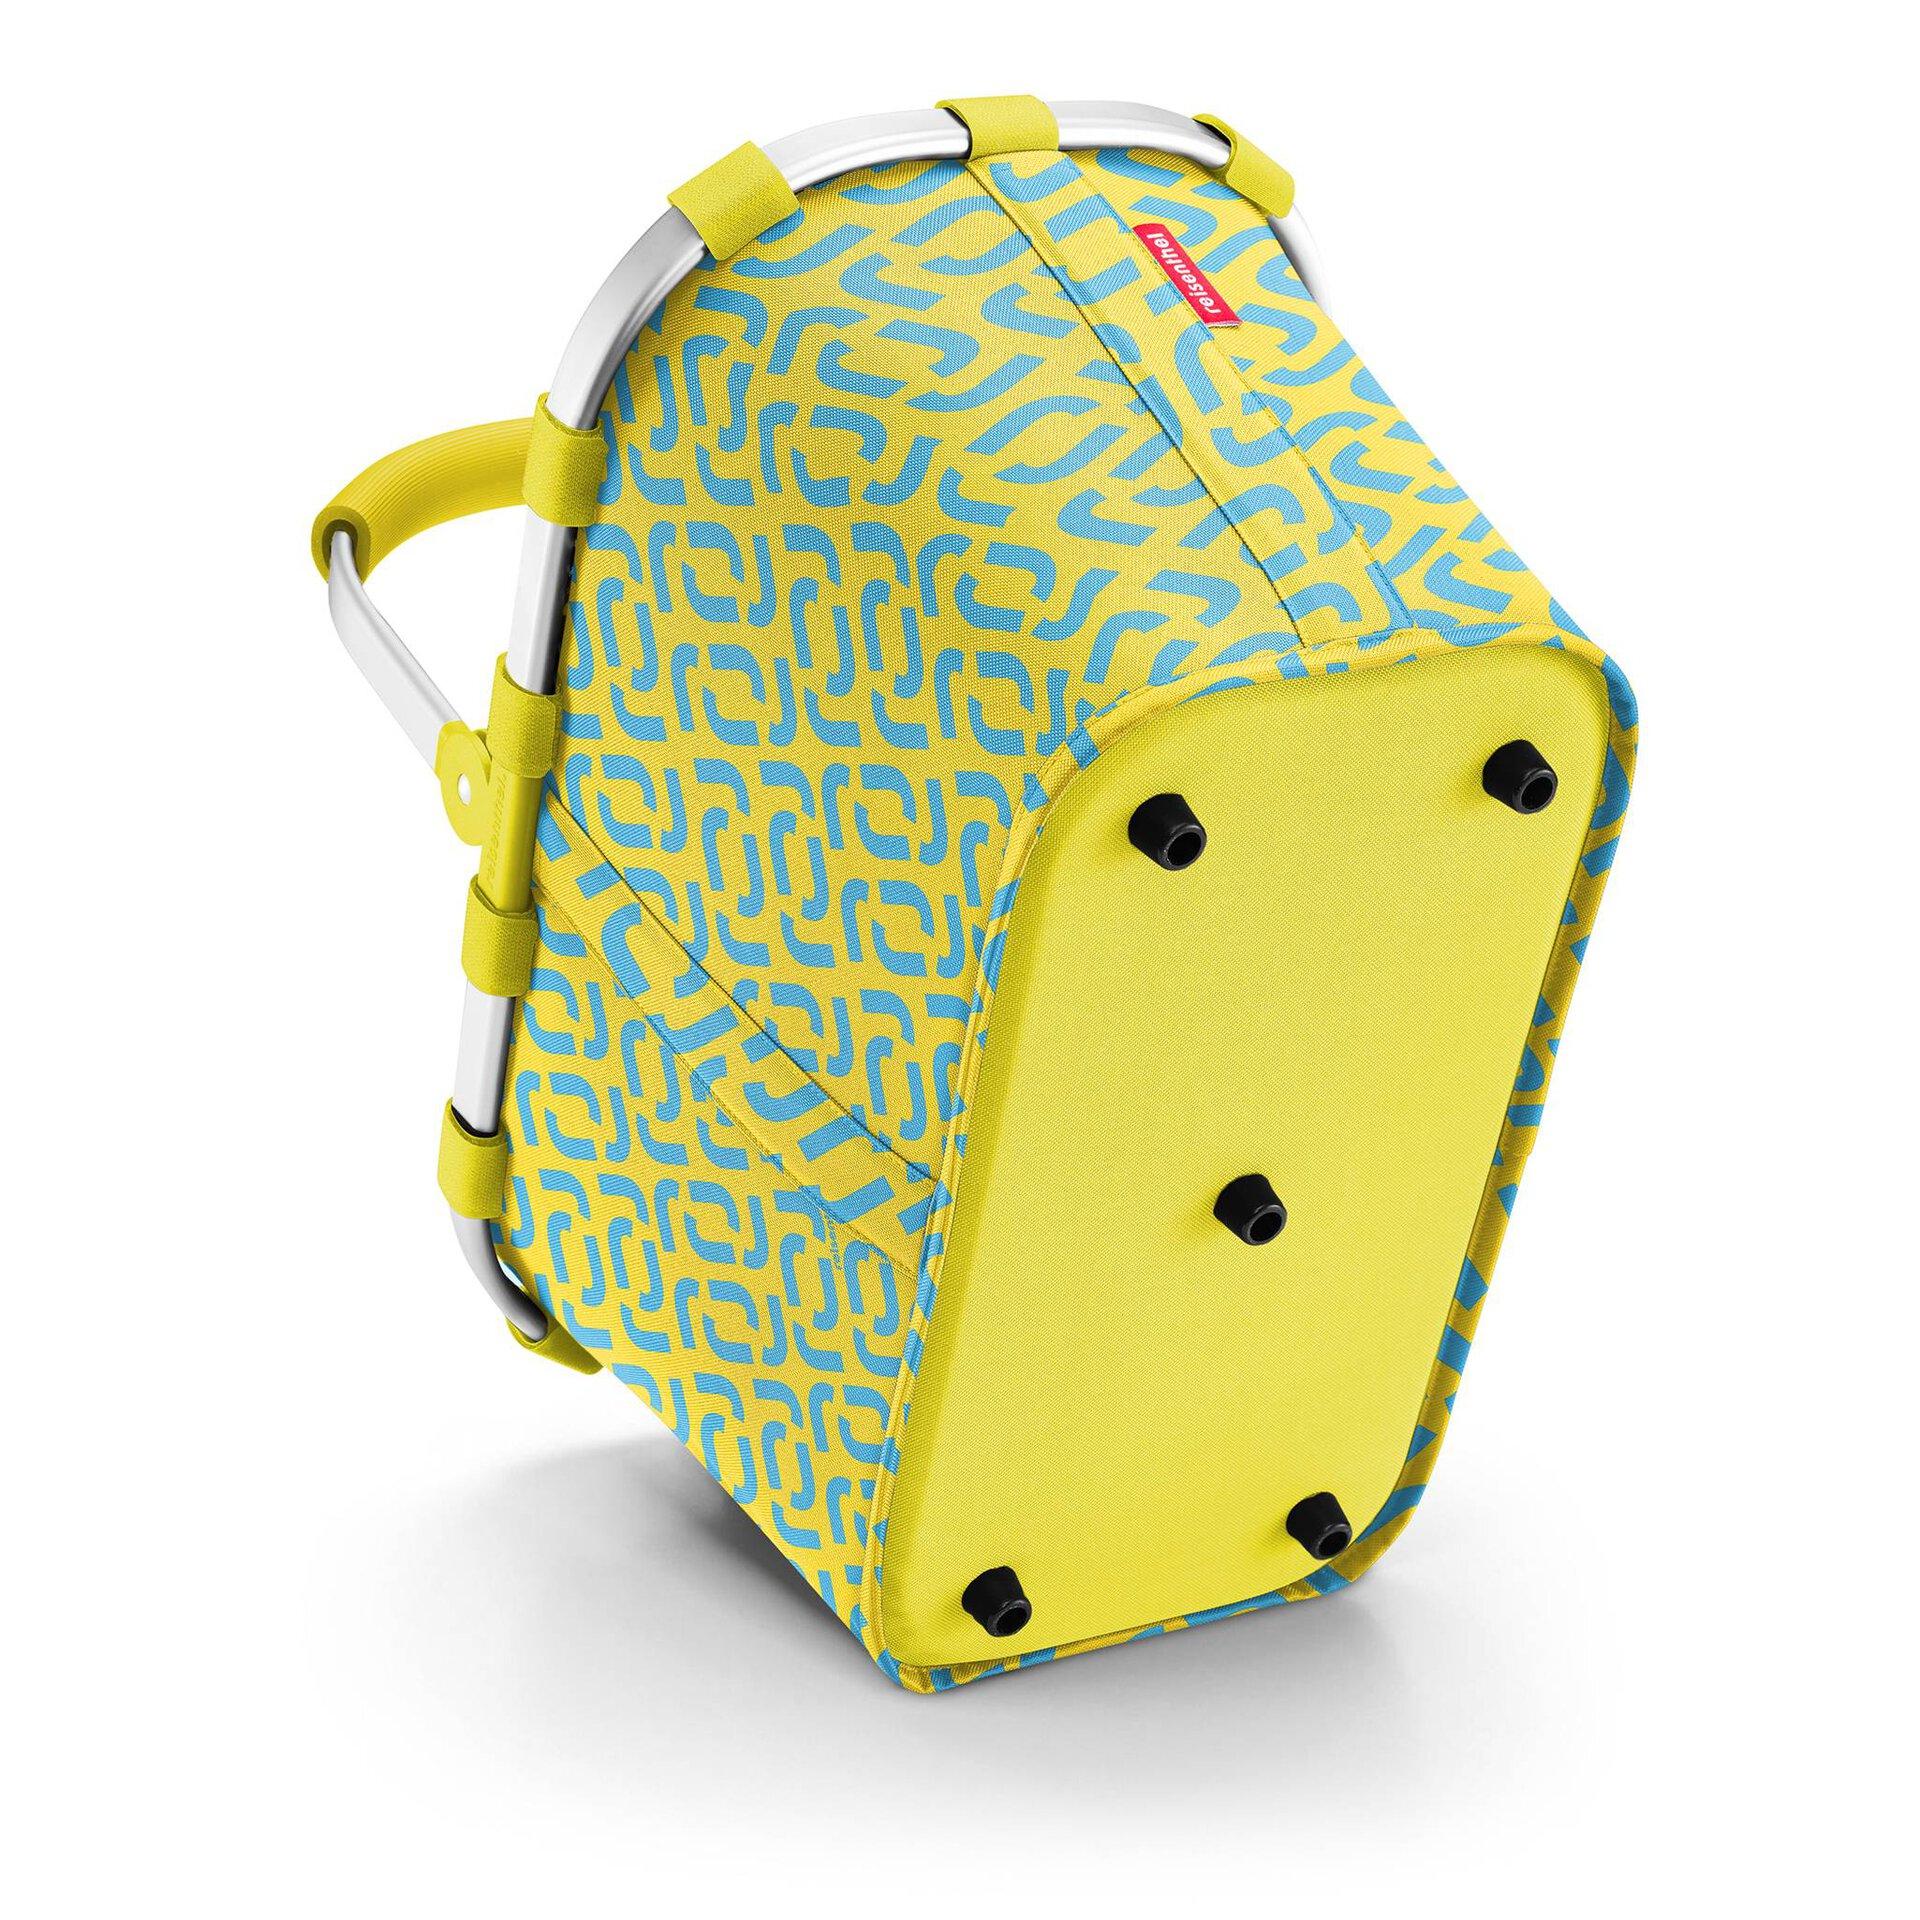 Tasche carrybag Reisenthel Textil 48 x 29 x